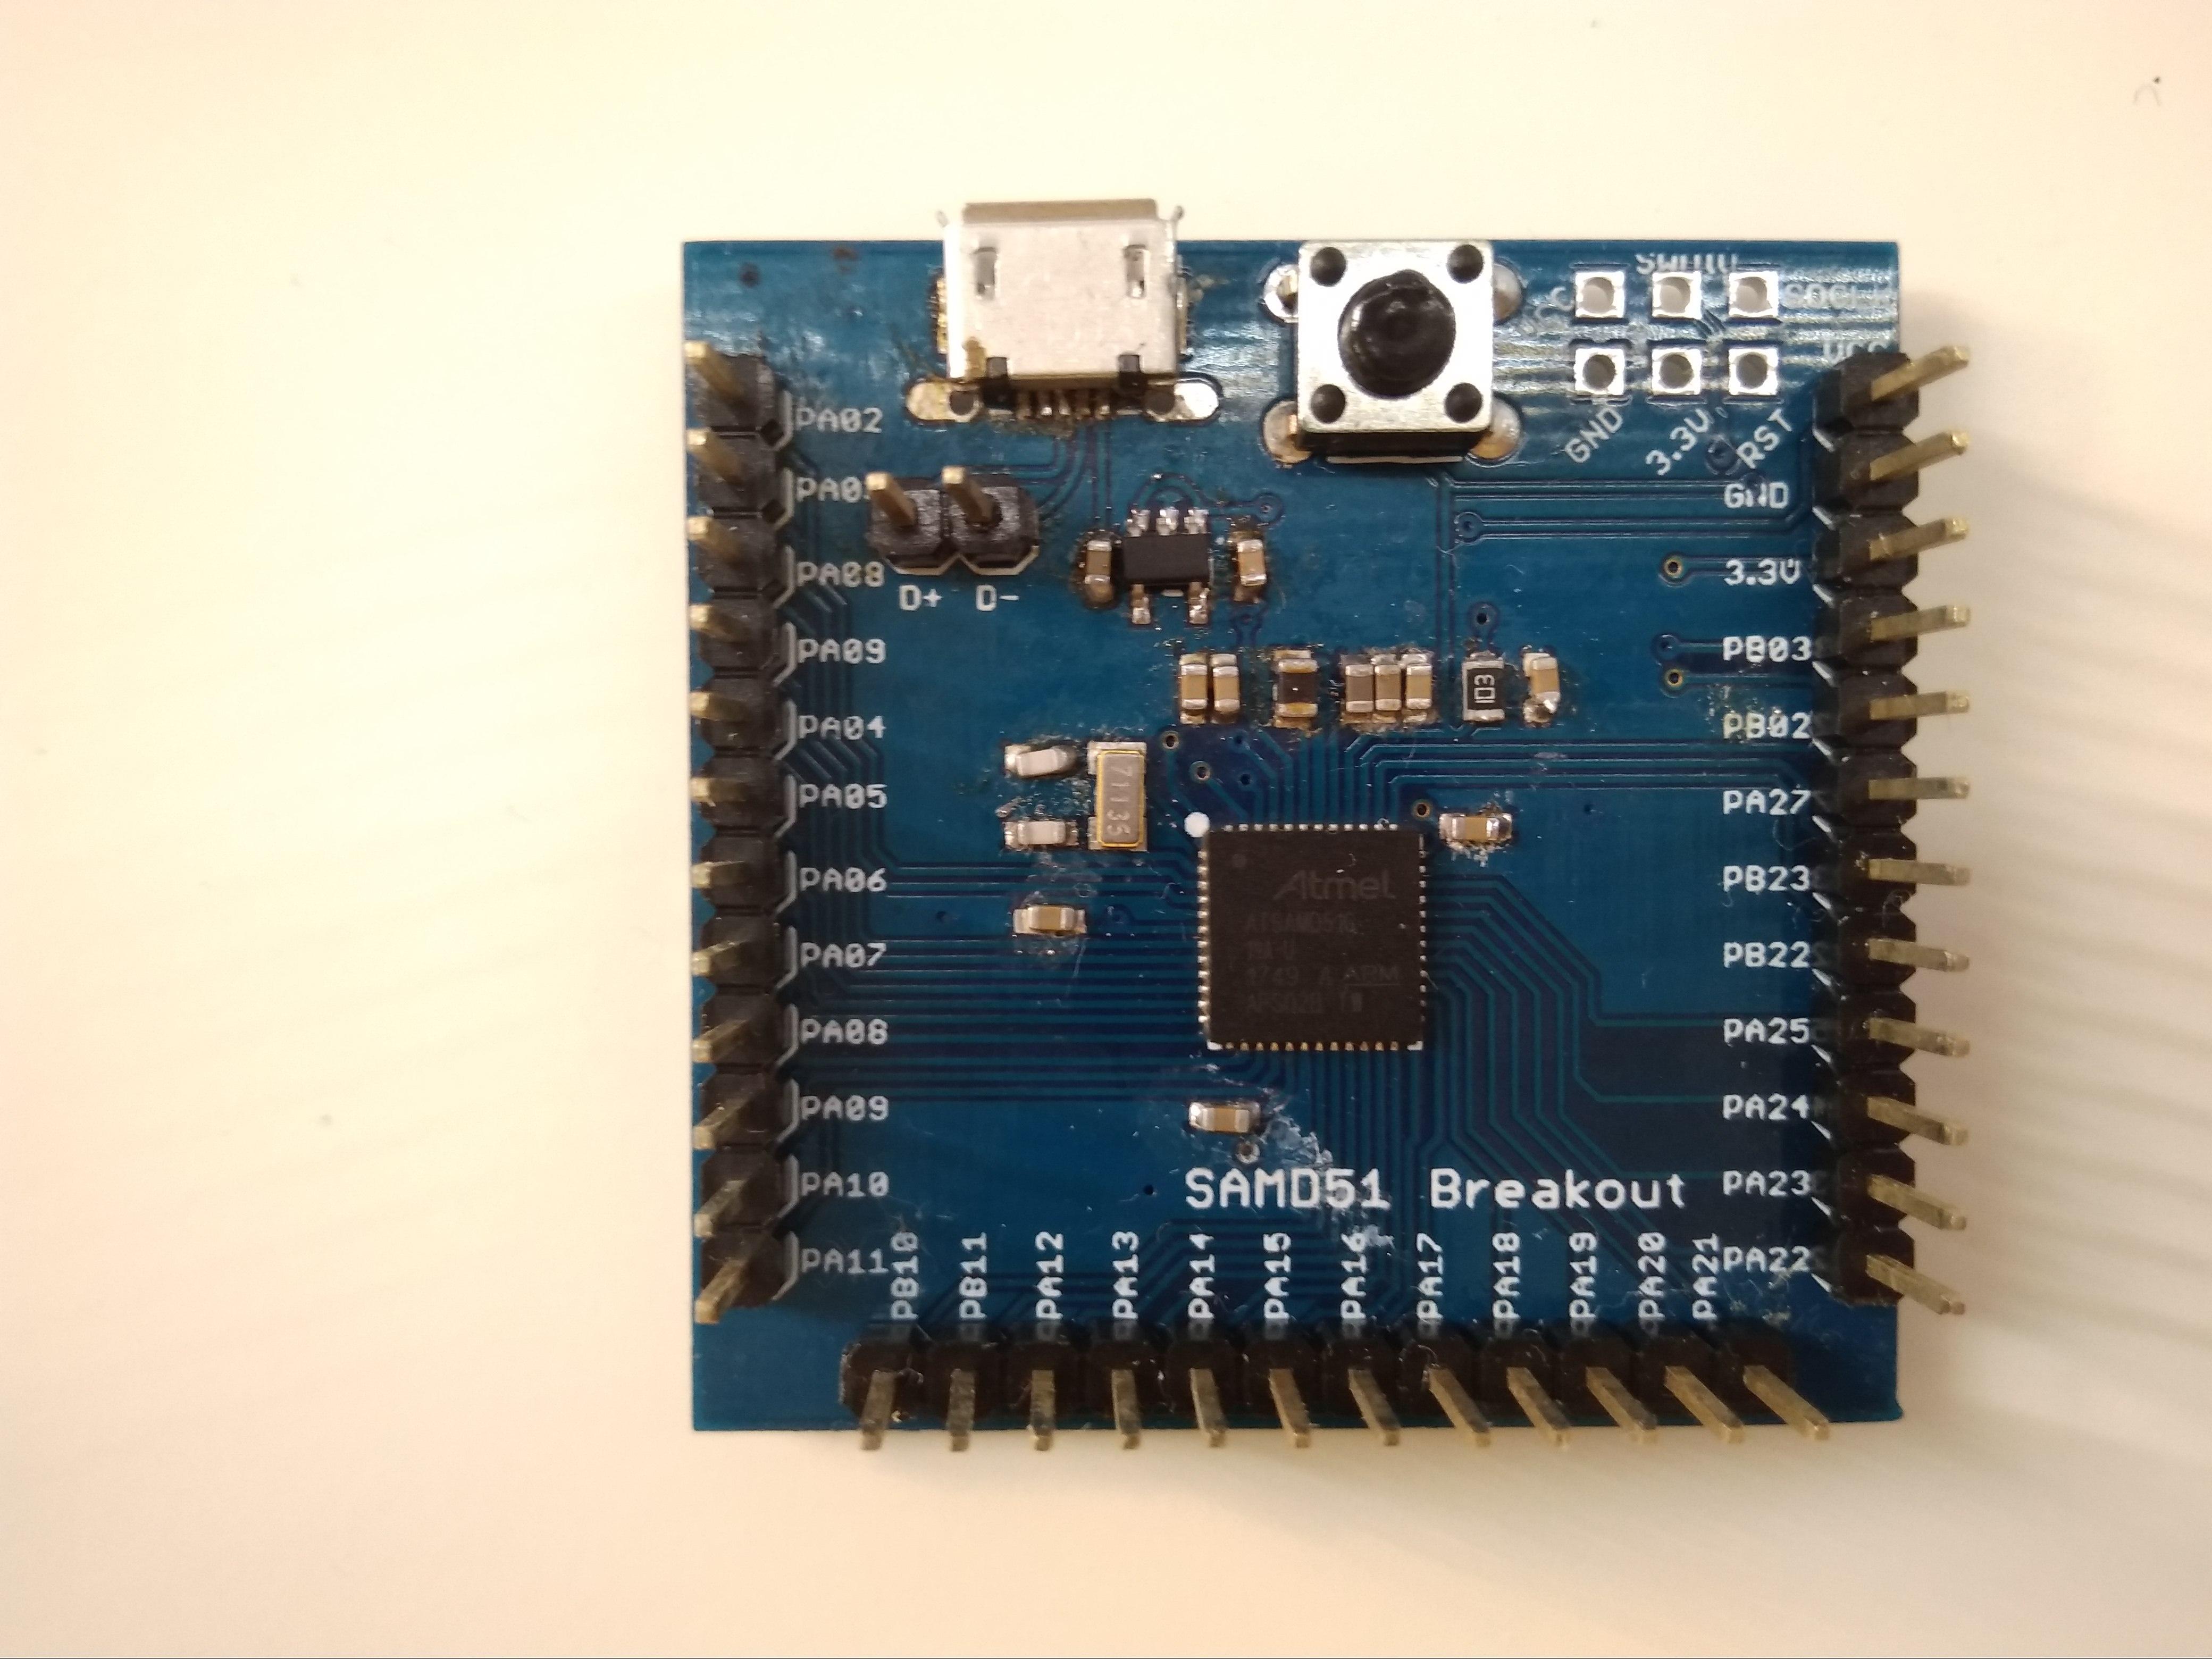 Building a SAMD51 Breakout board